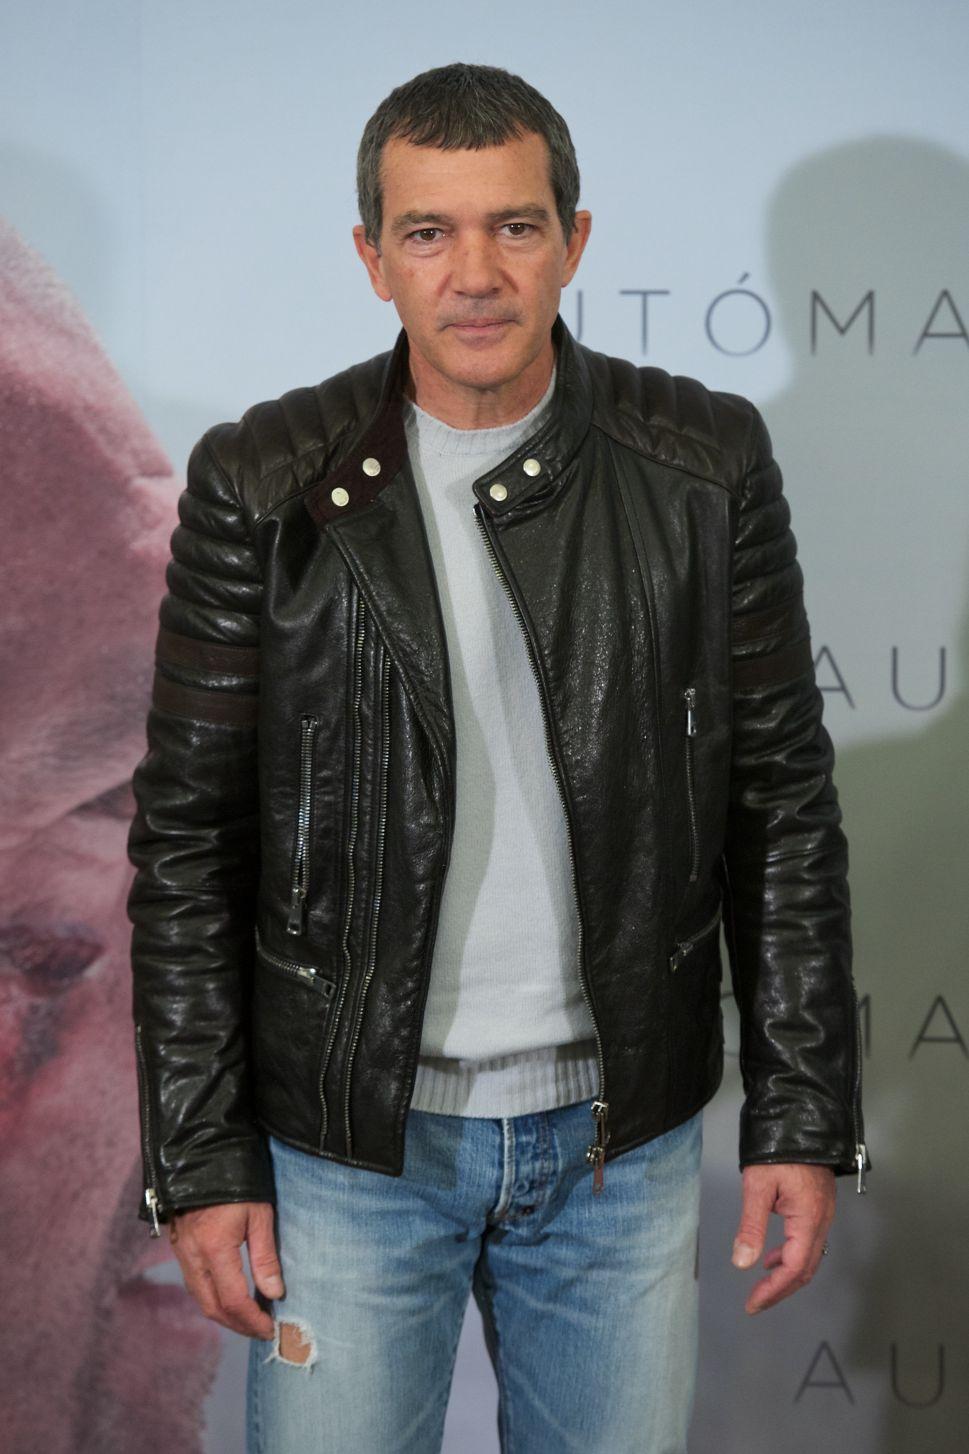 Antonio Banderas Follows His Dream and Enrolls in Fashion School